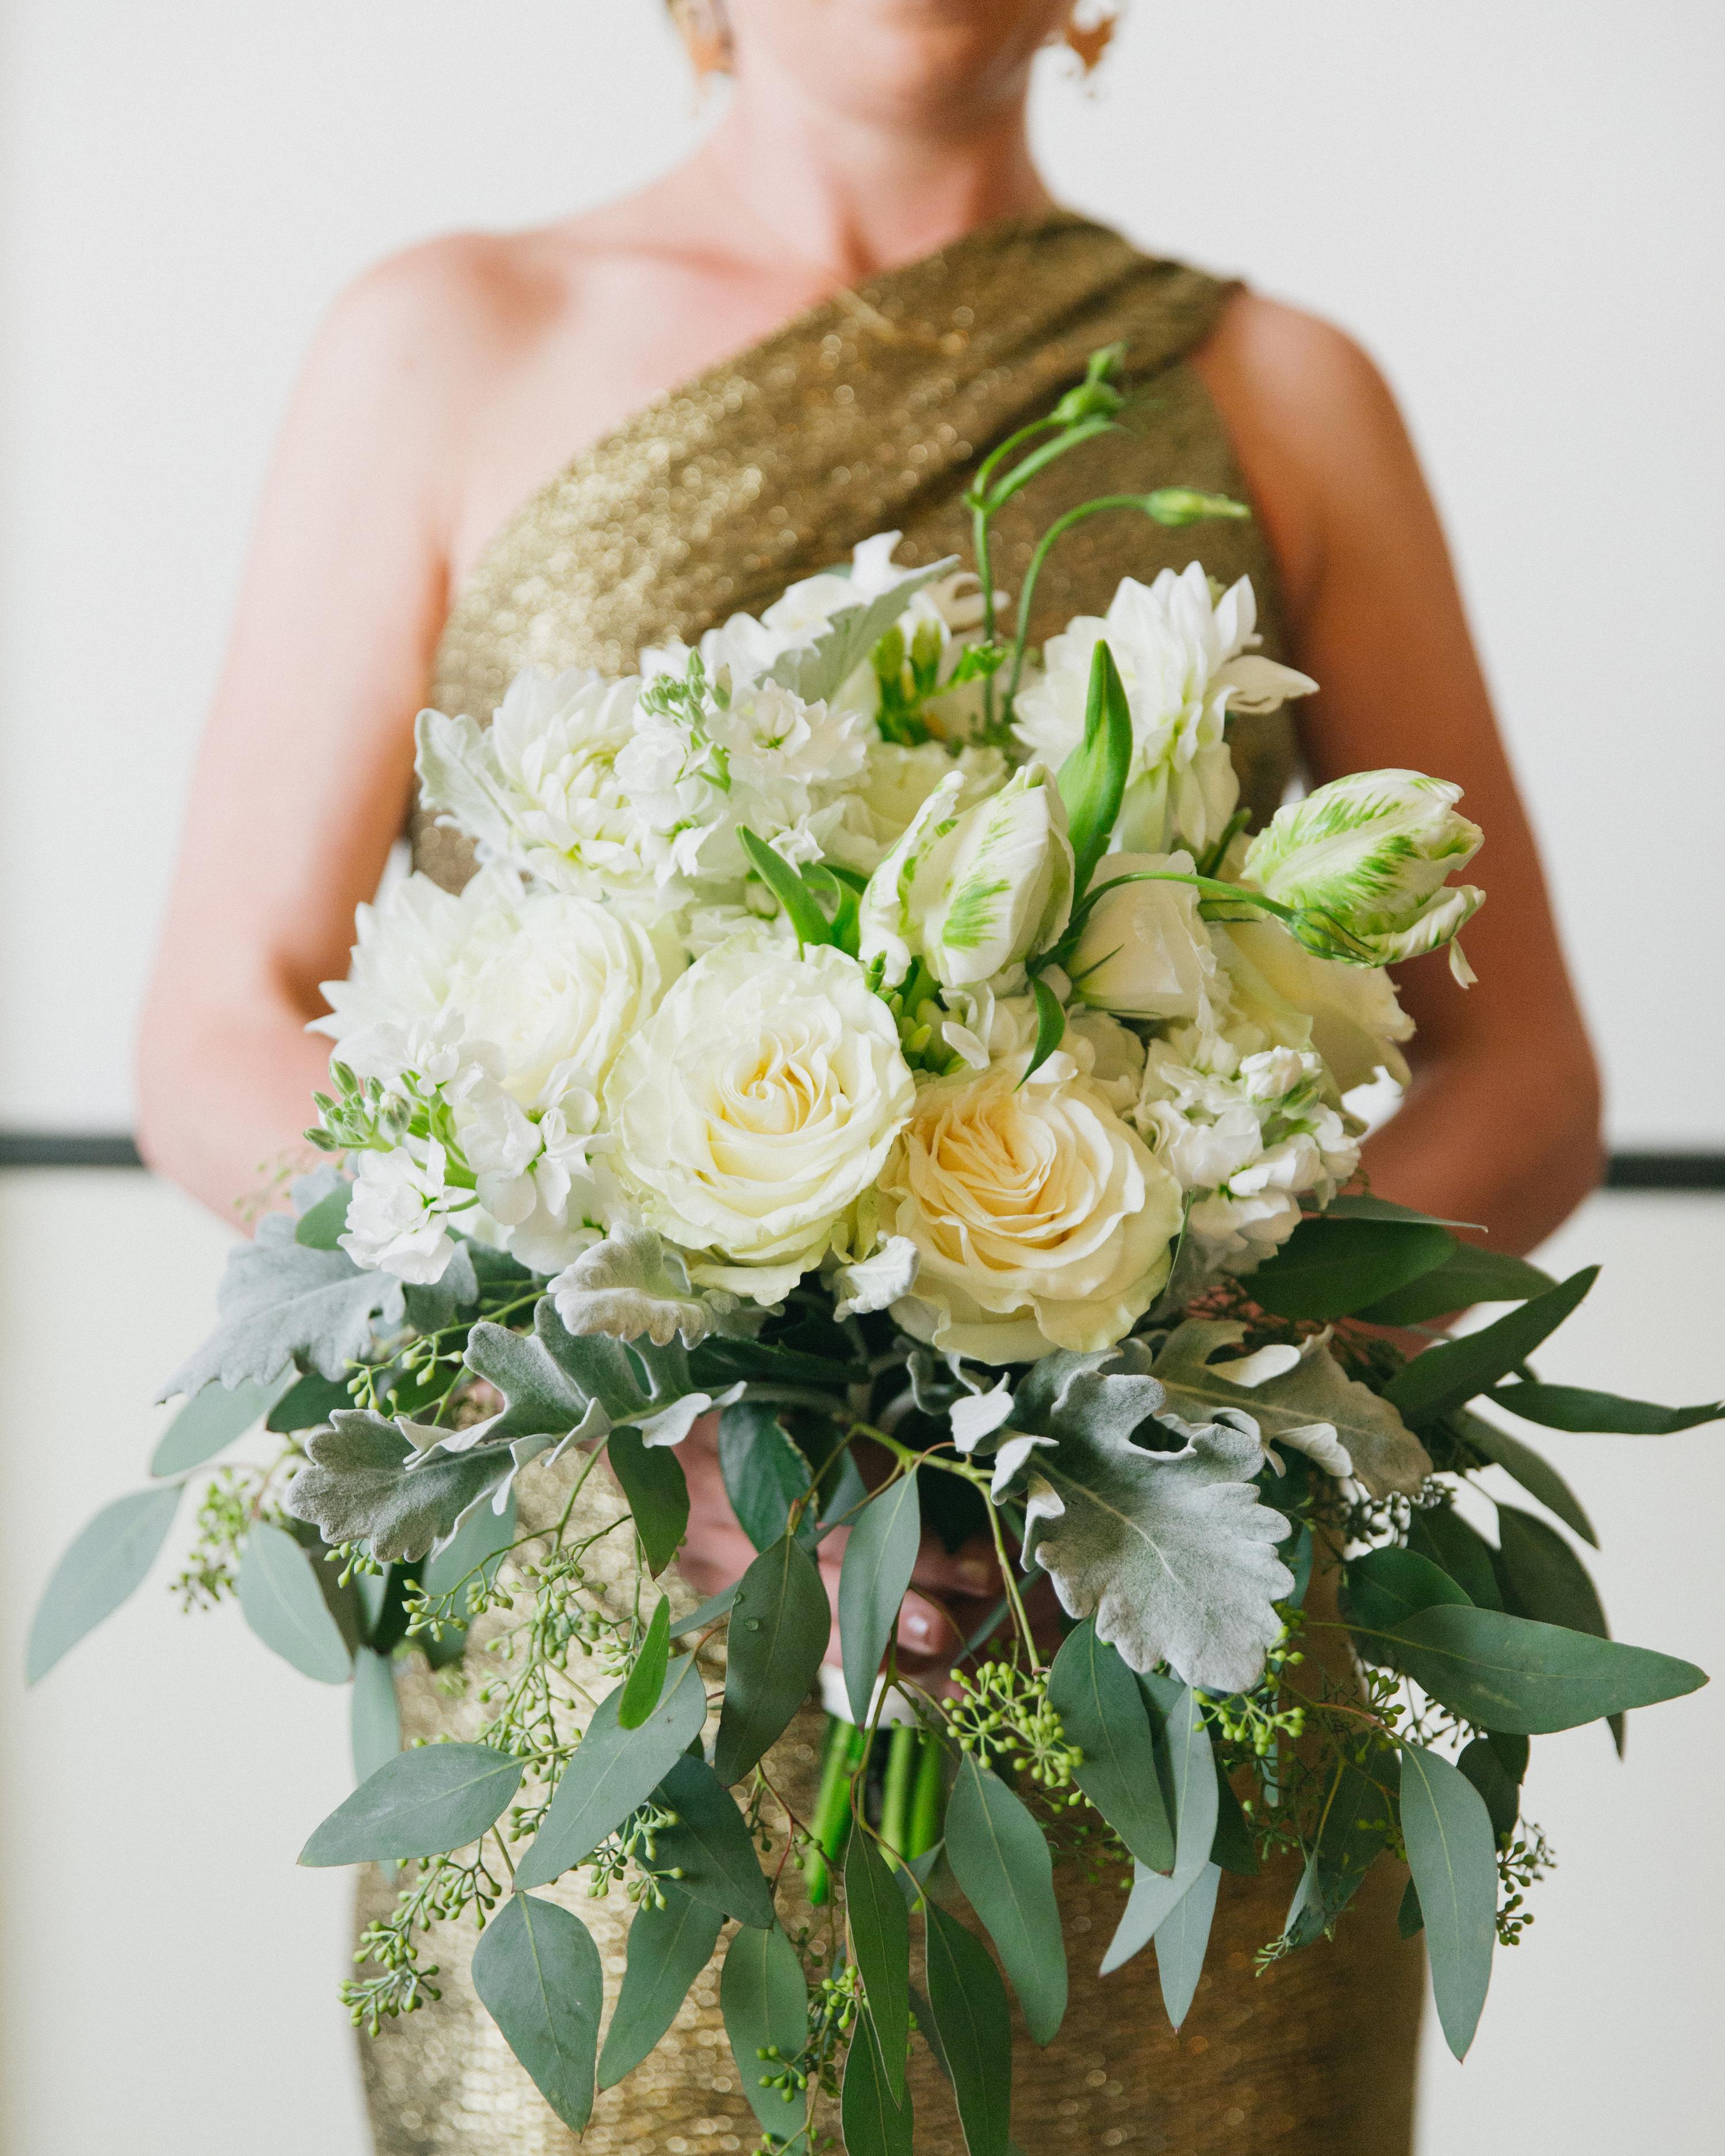 amy-bob-wedding-bouquet-0222-s111884-0715.jpg